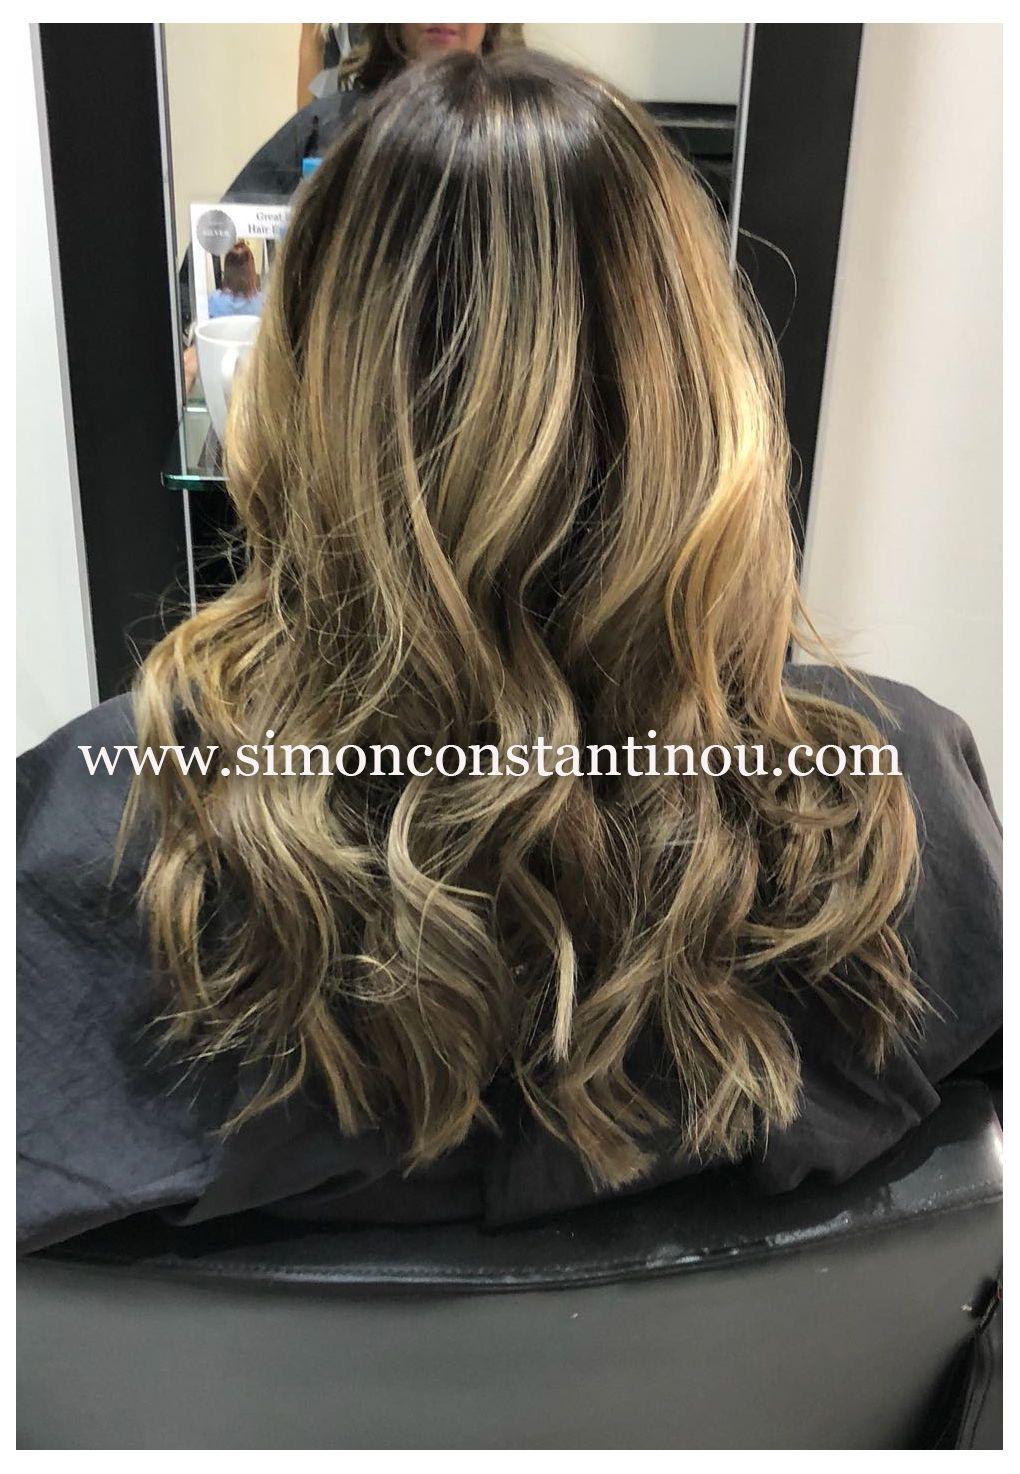 Hair Salon & Price List. Simon Constantinou